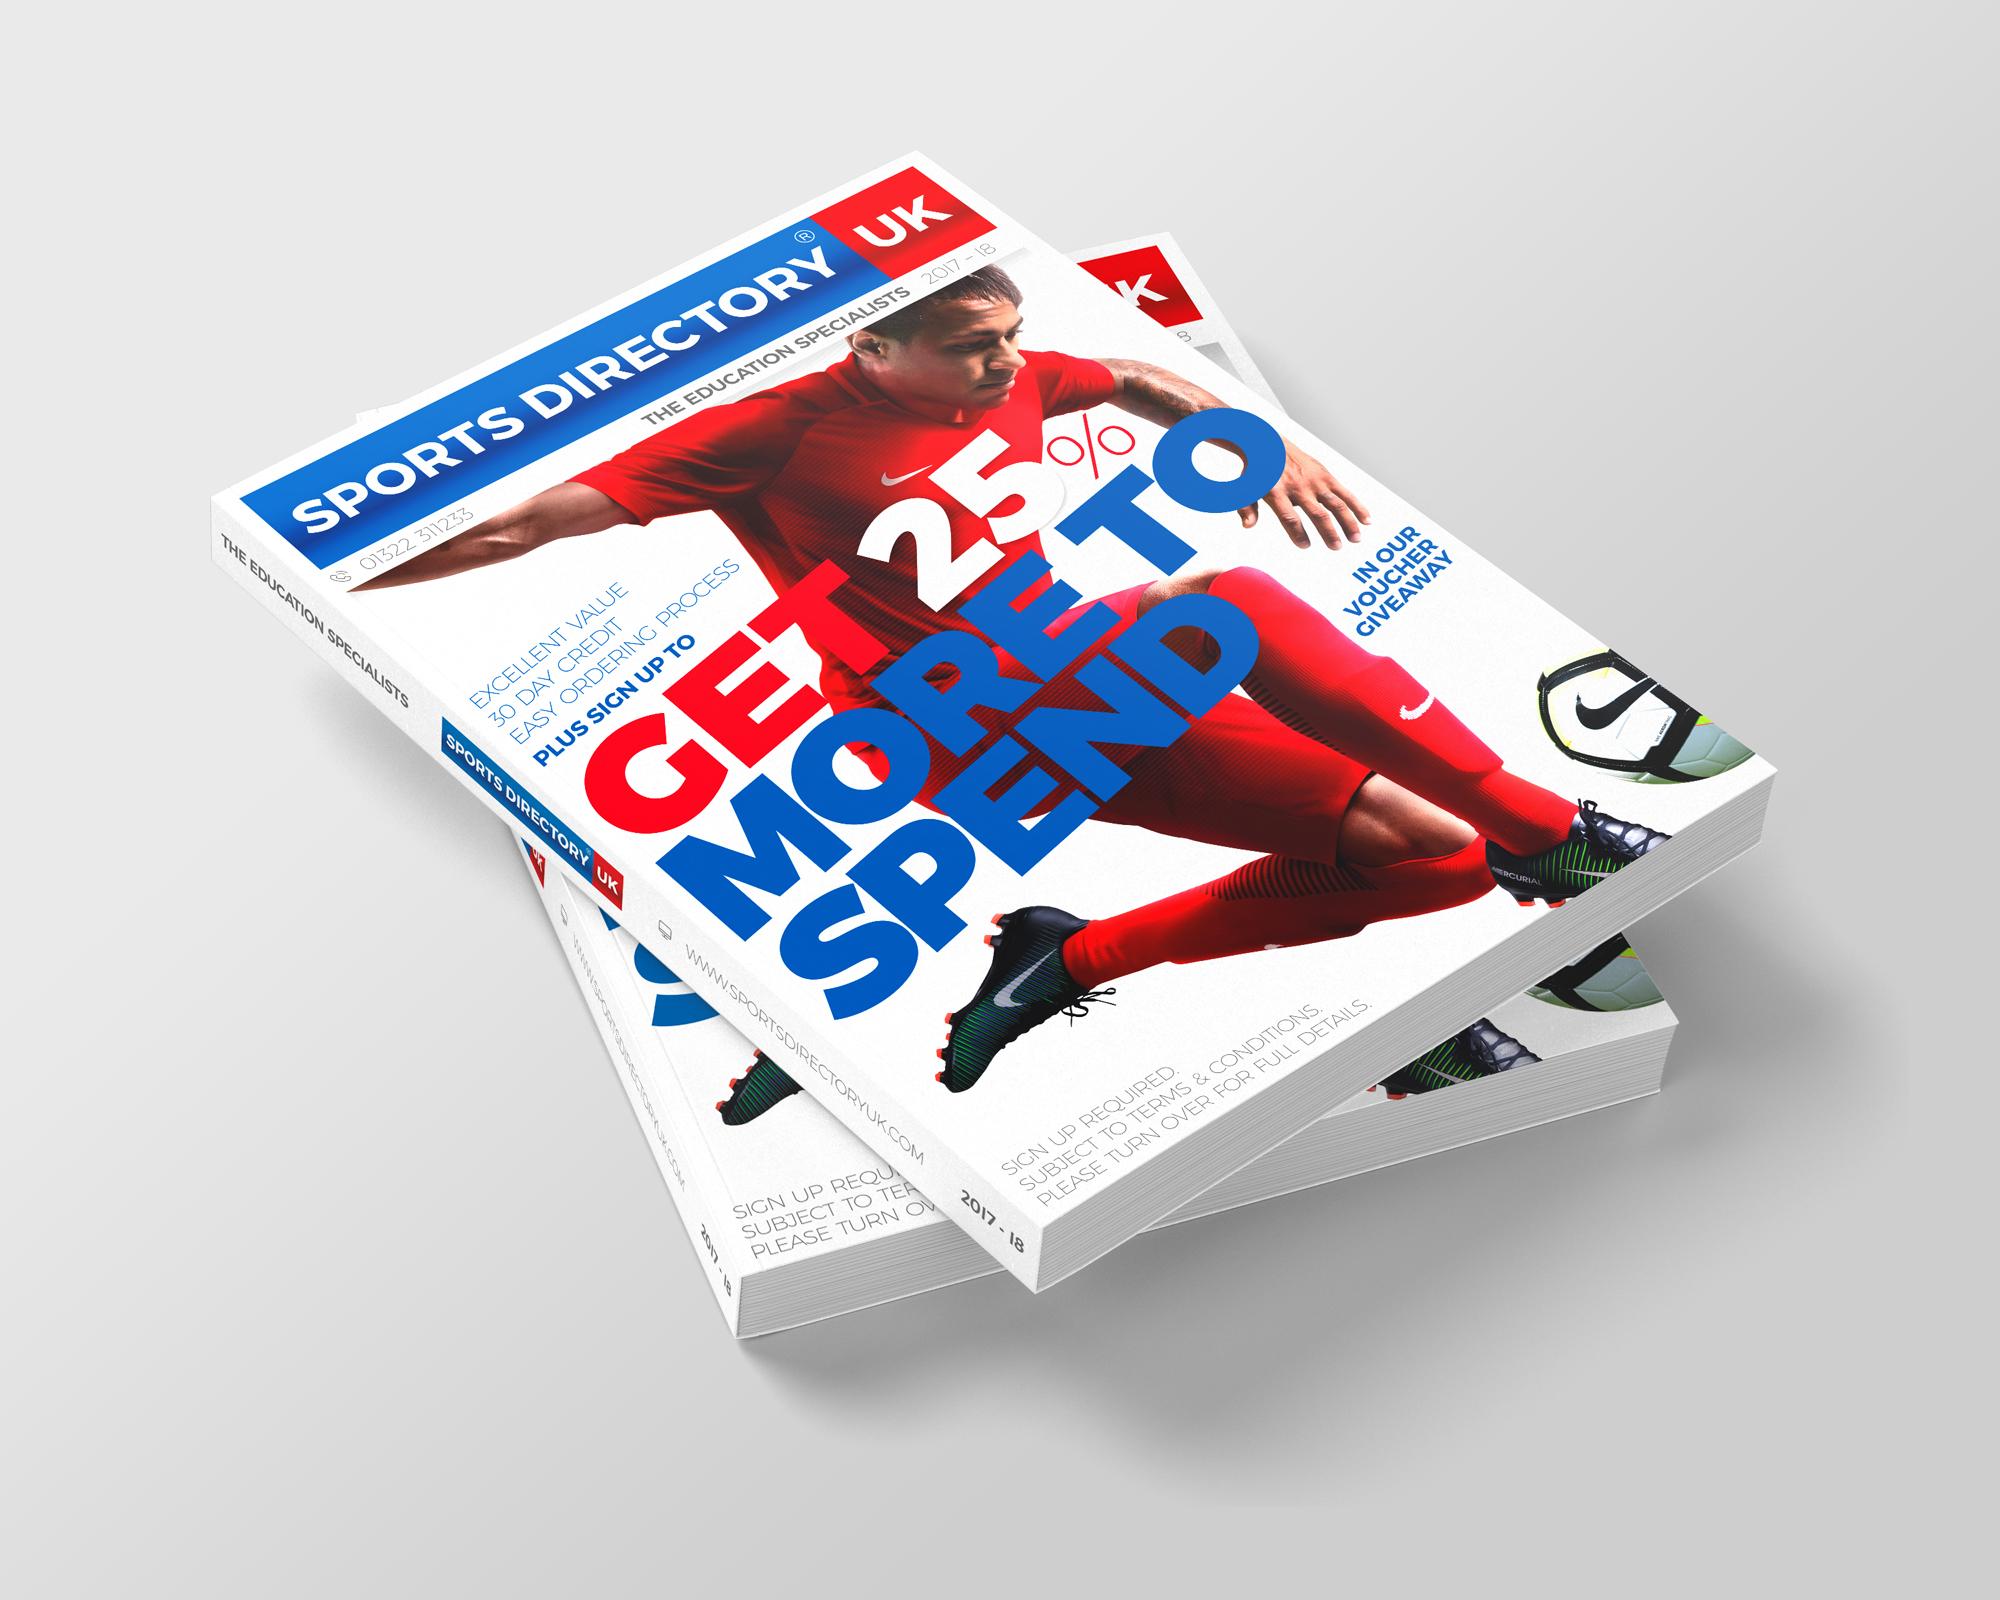 Sports Directory Visual Identity / Logobou 14